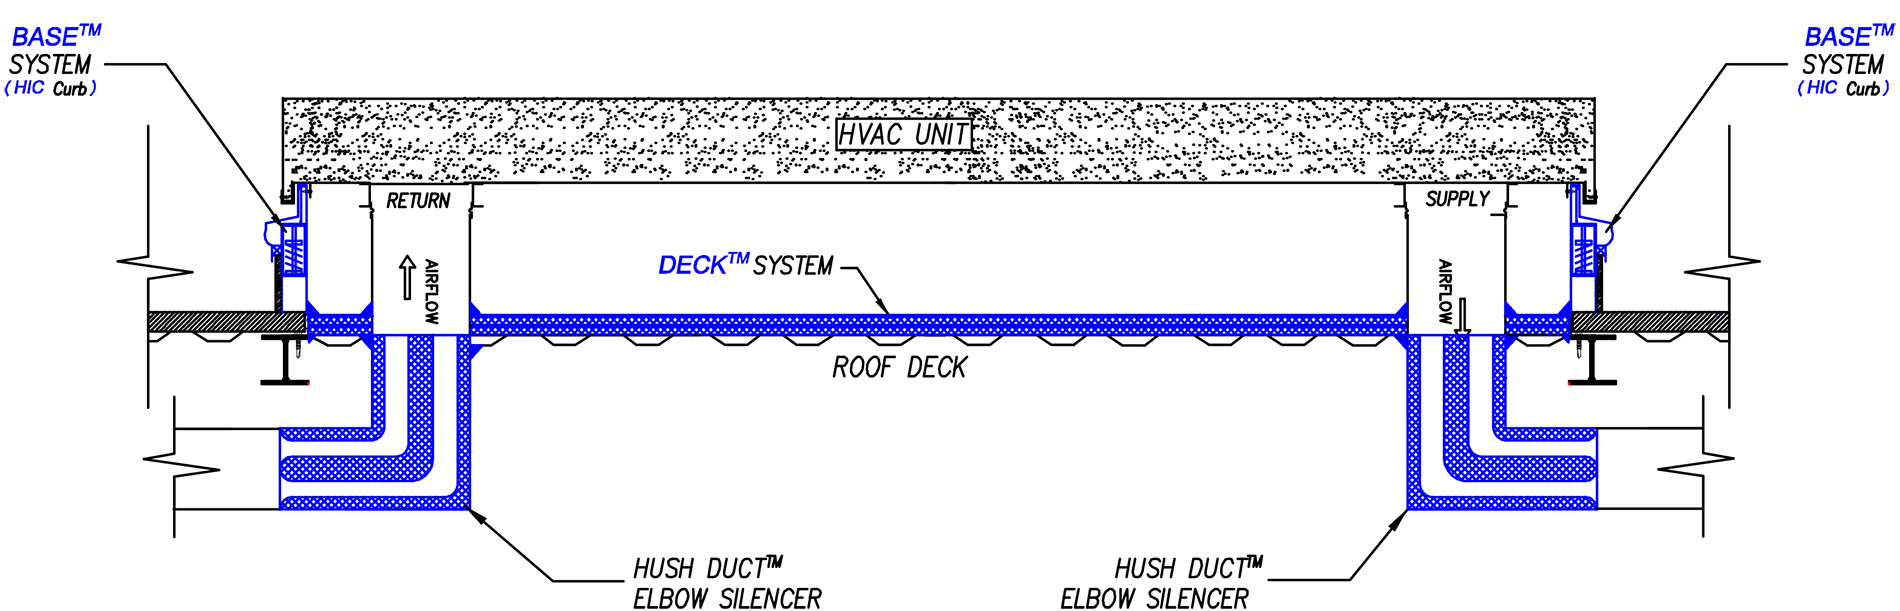 generic-hushcore-plus-e-system-rtu-curb-acoustical-system